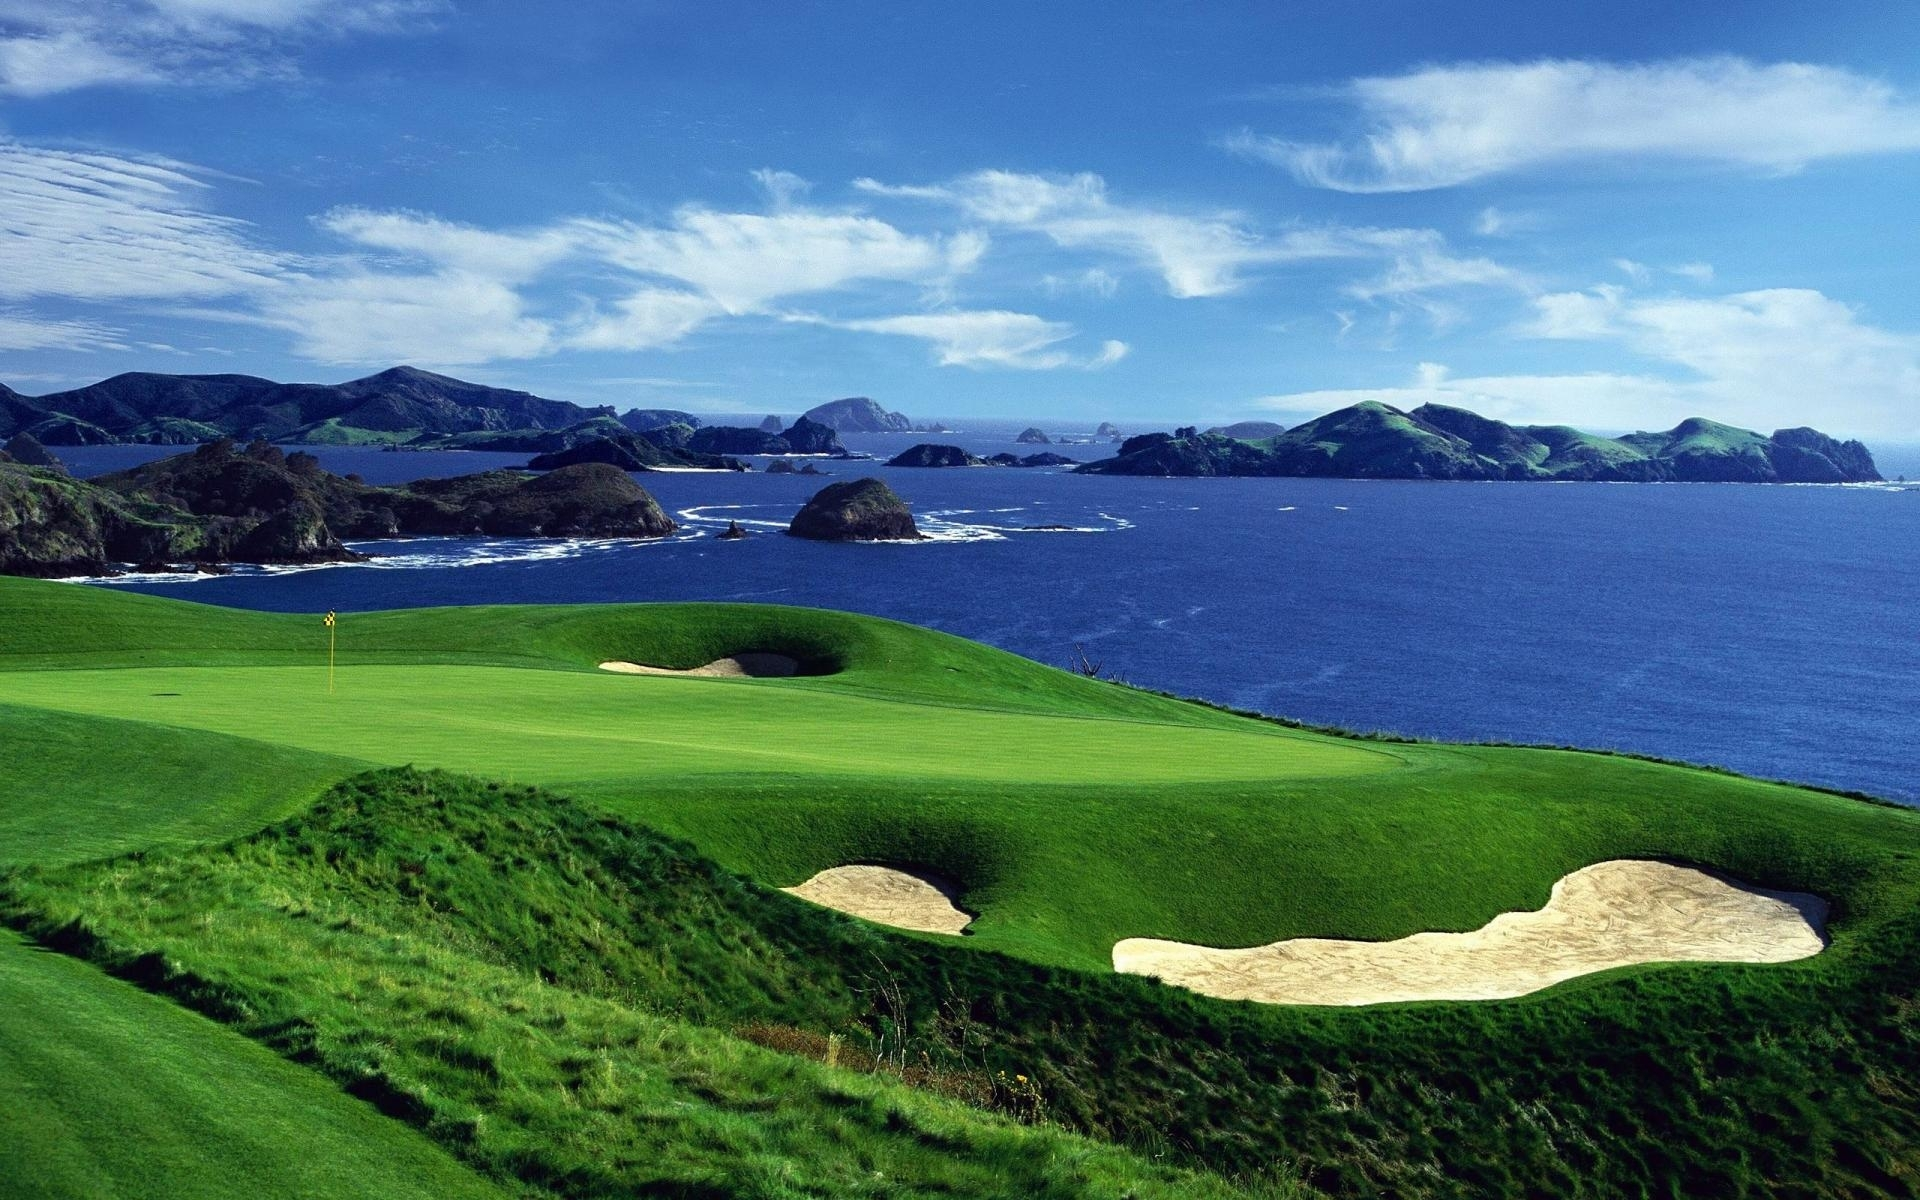 golf course desktop wallpaper - wallpaper bits